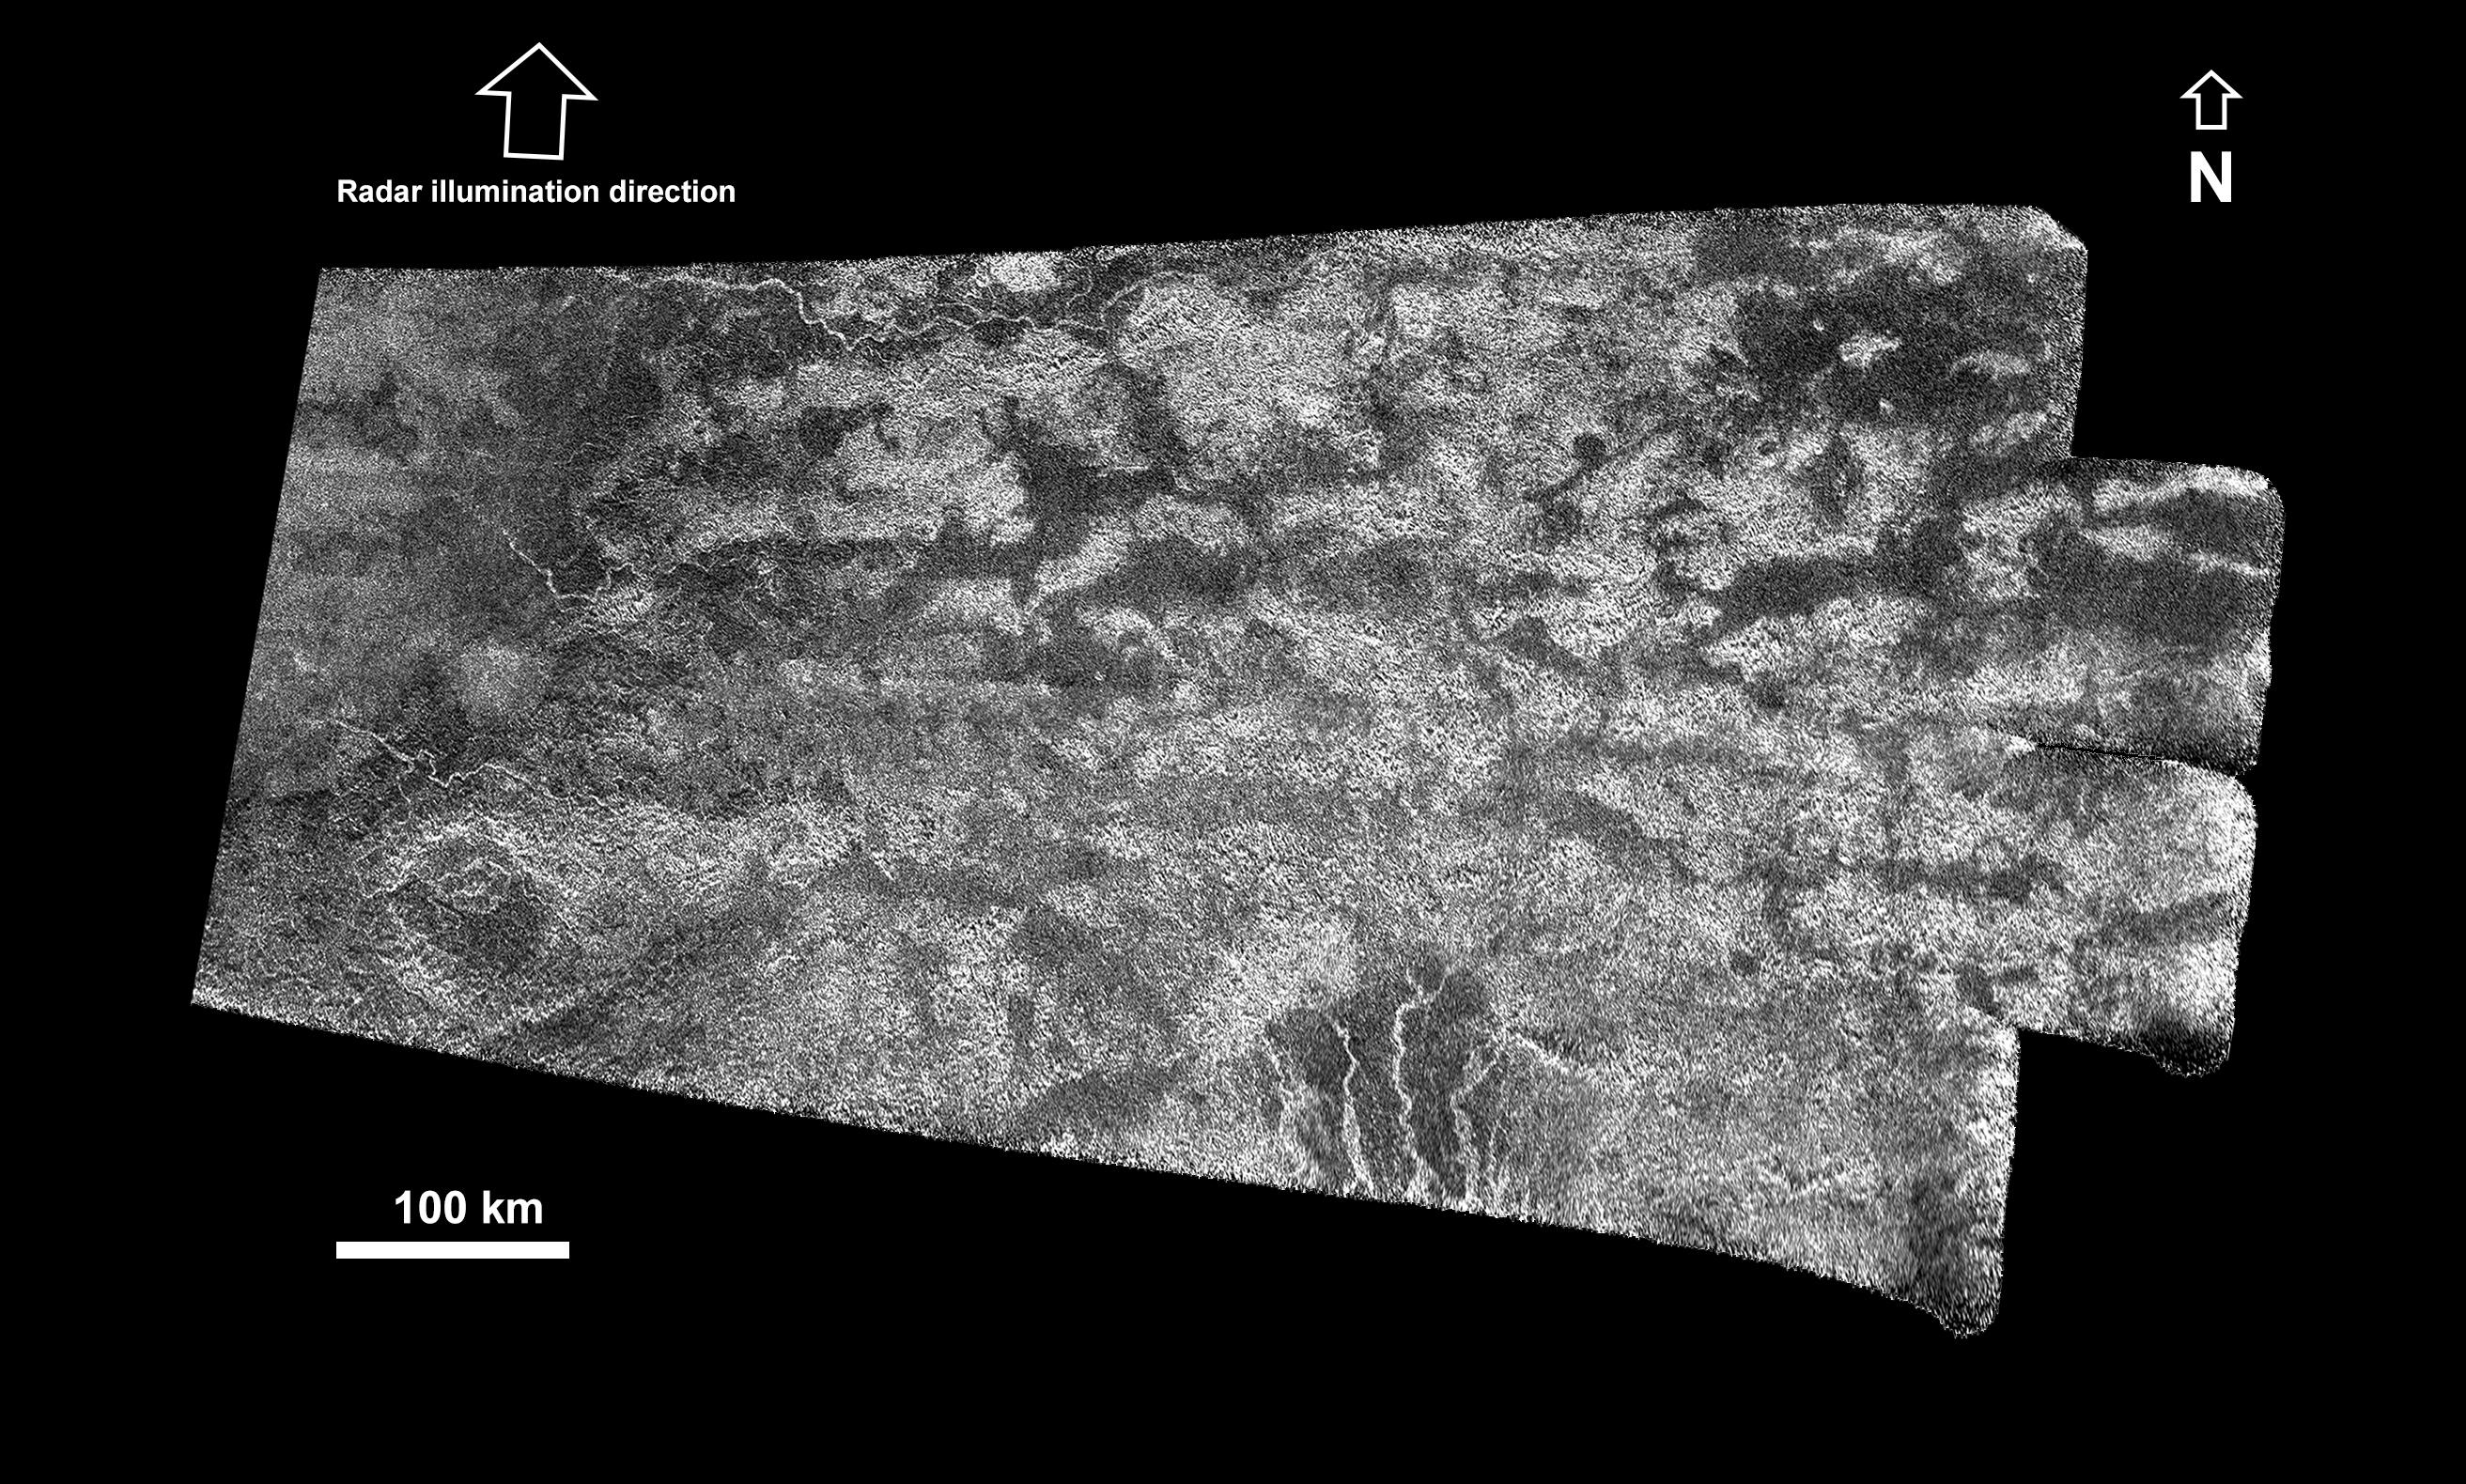 1567215421266-Cassini_SAR_Titan_Xanadu_annex_PIA20712_labeled.jpg